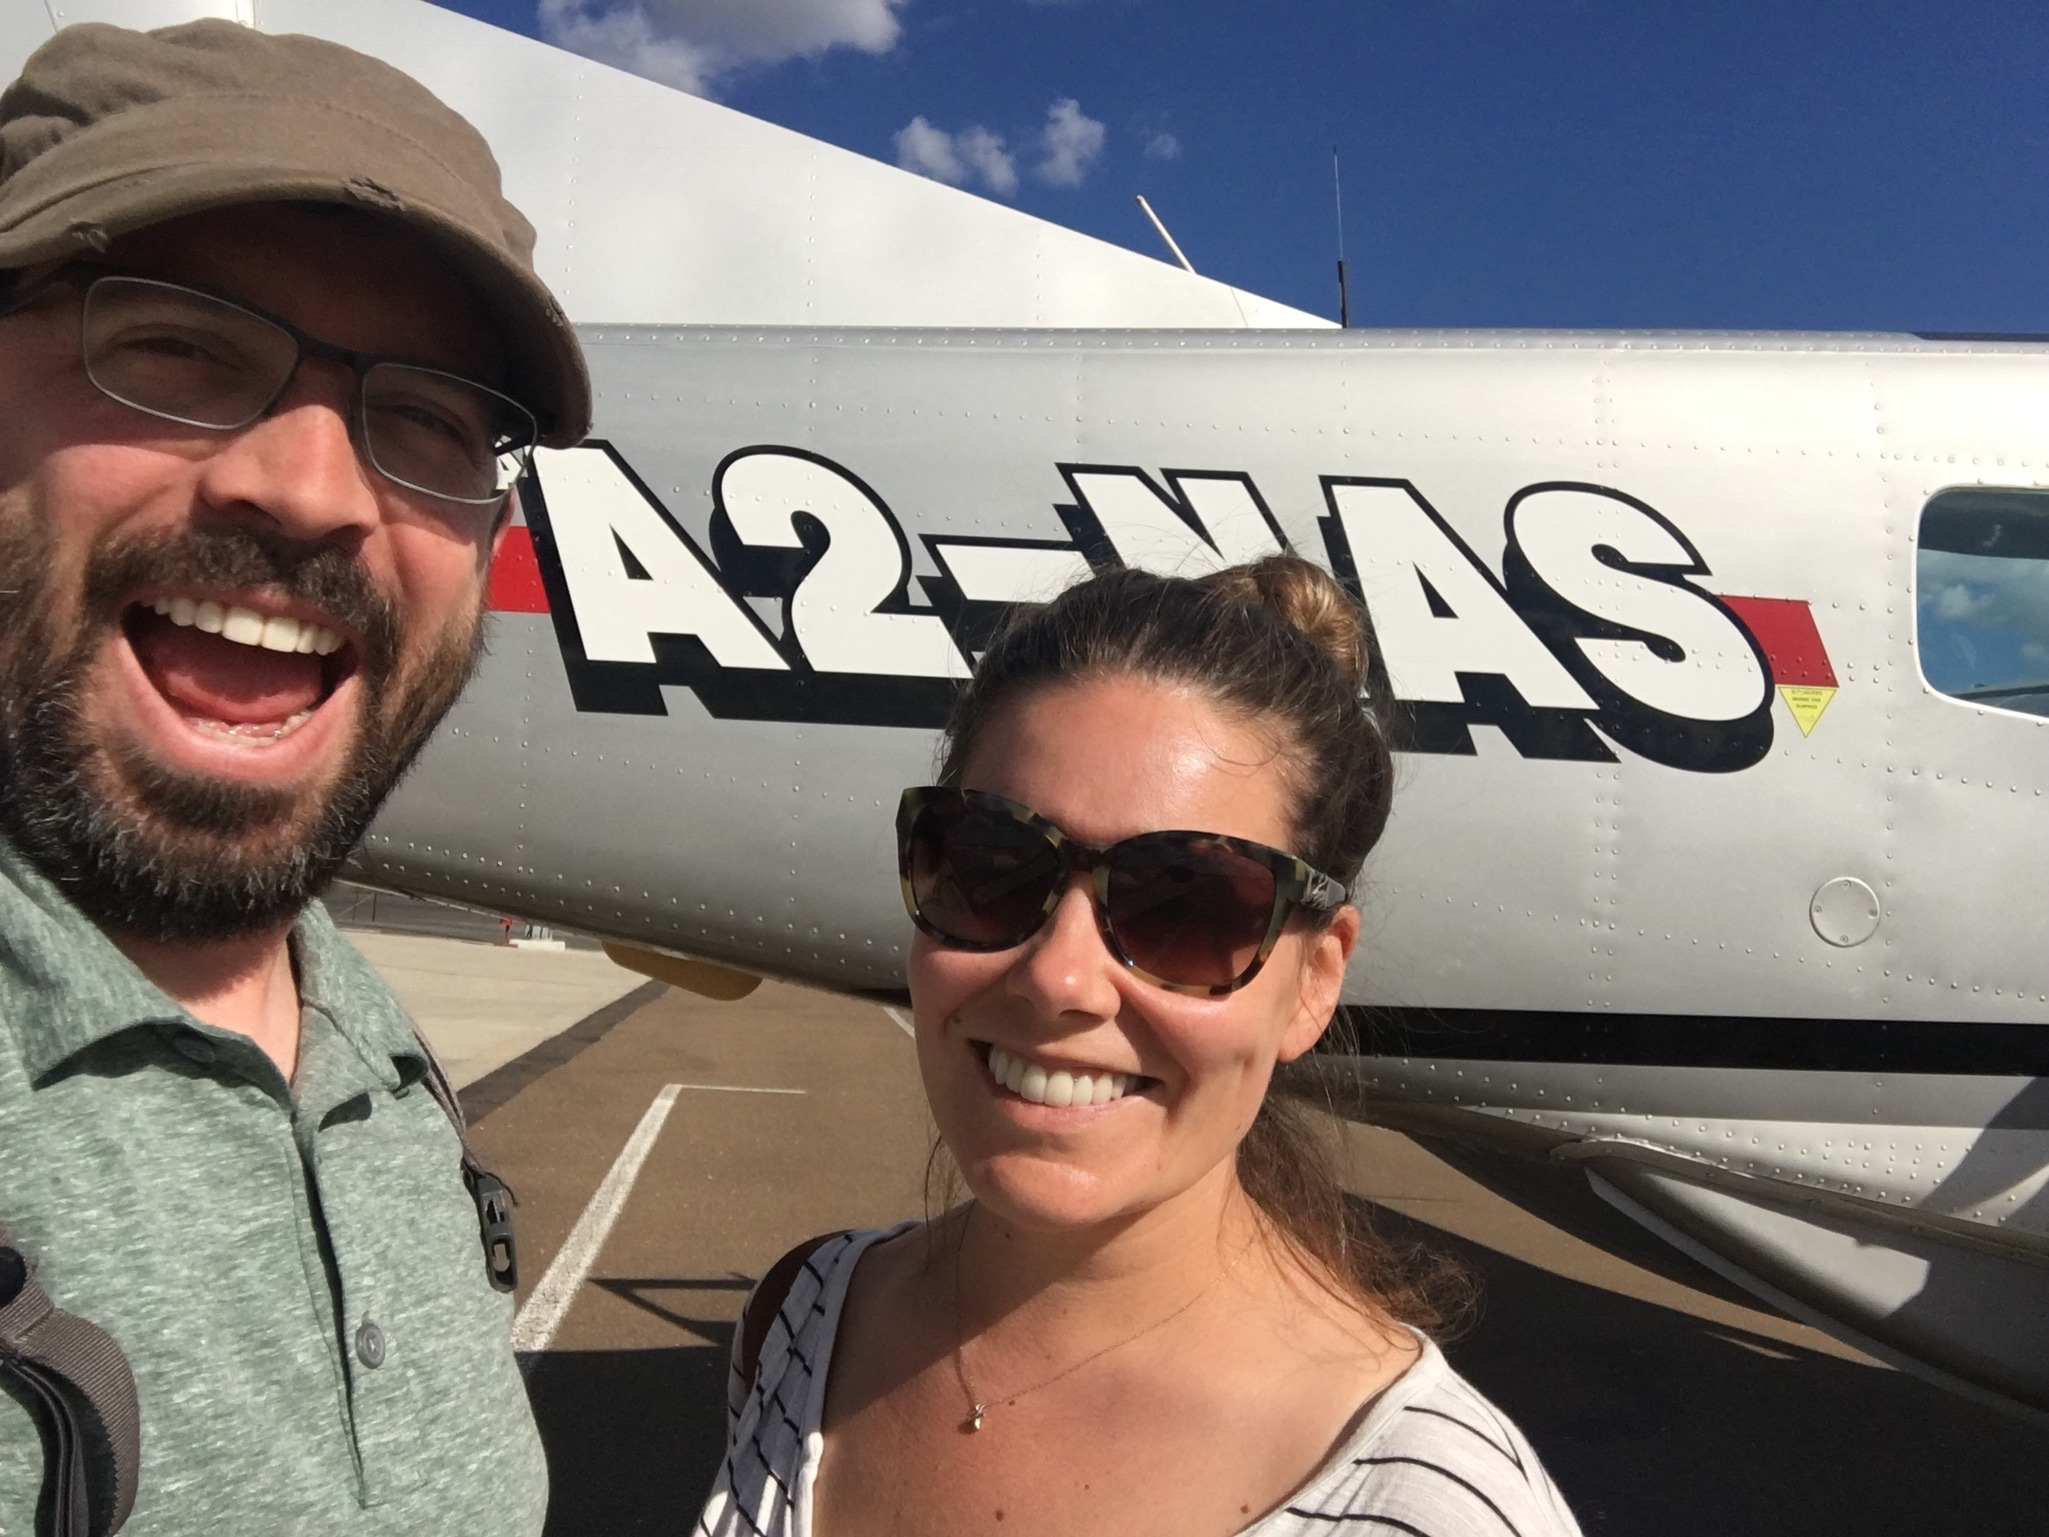 Boarding our flight to Zavuti